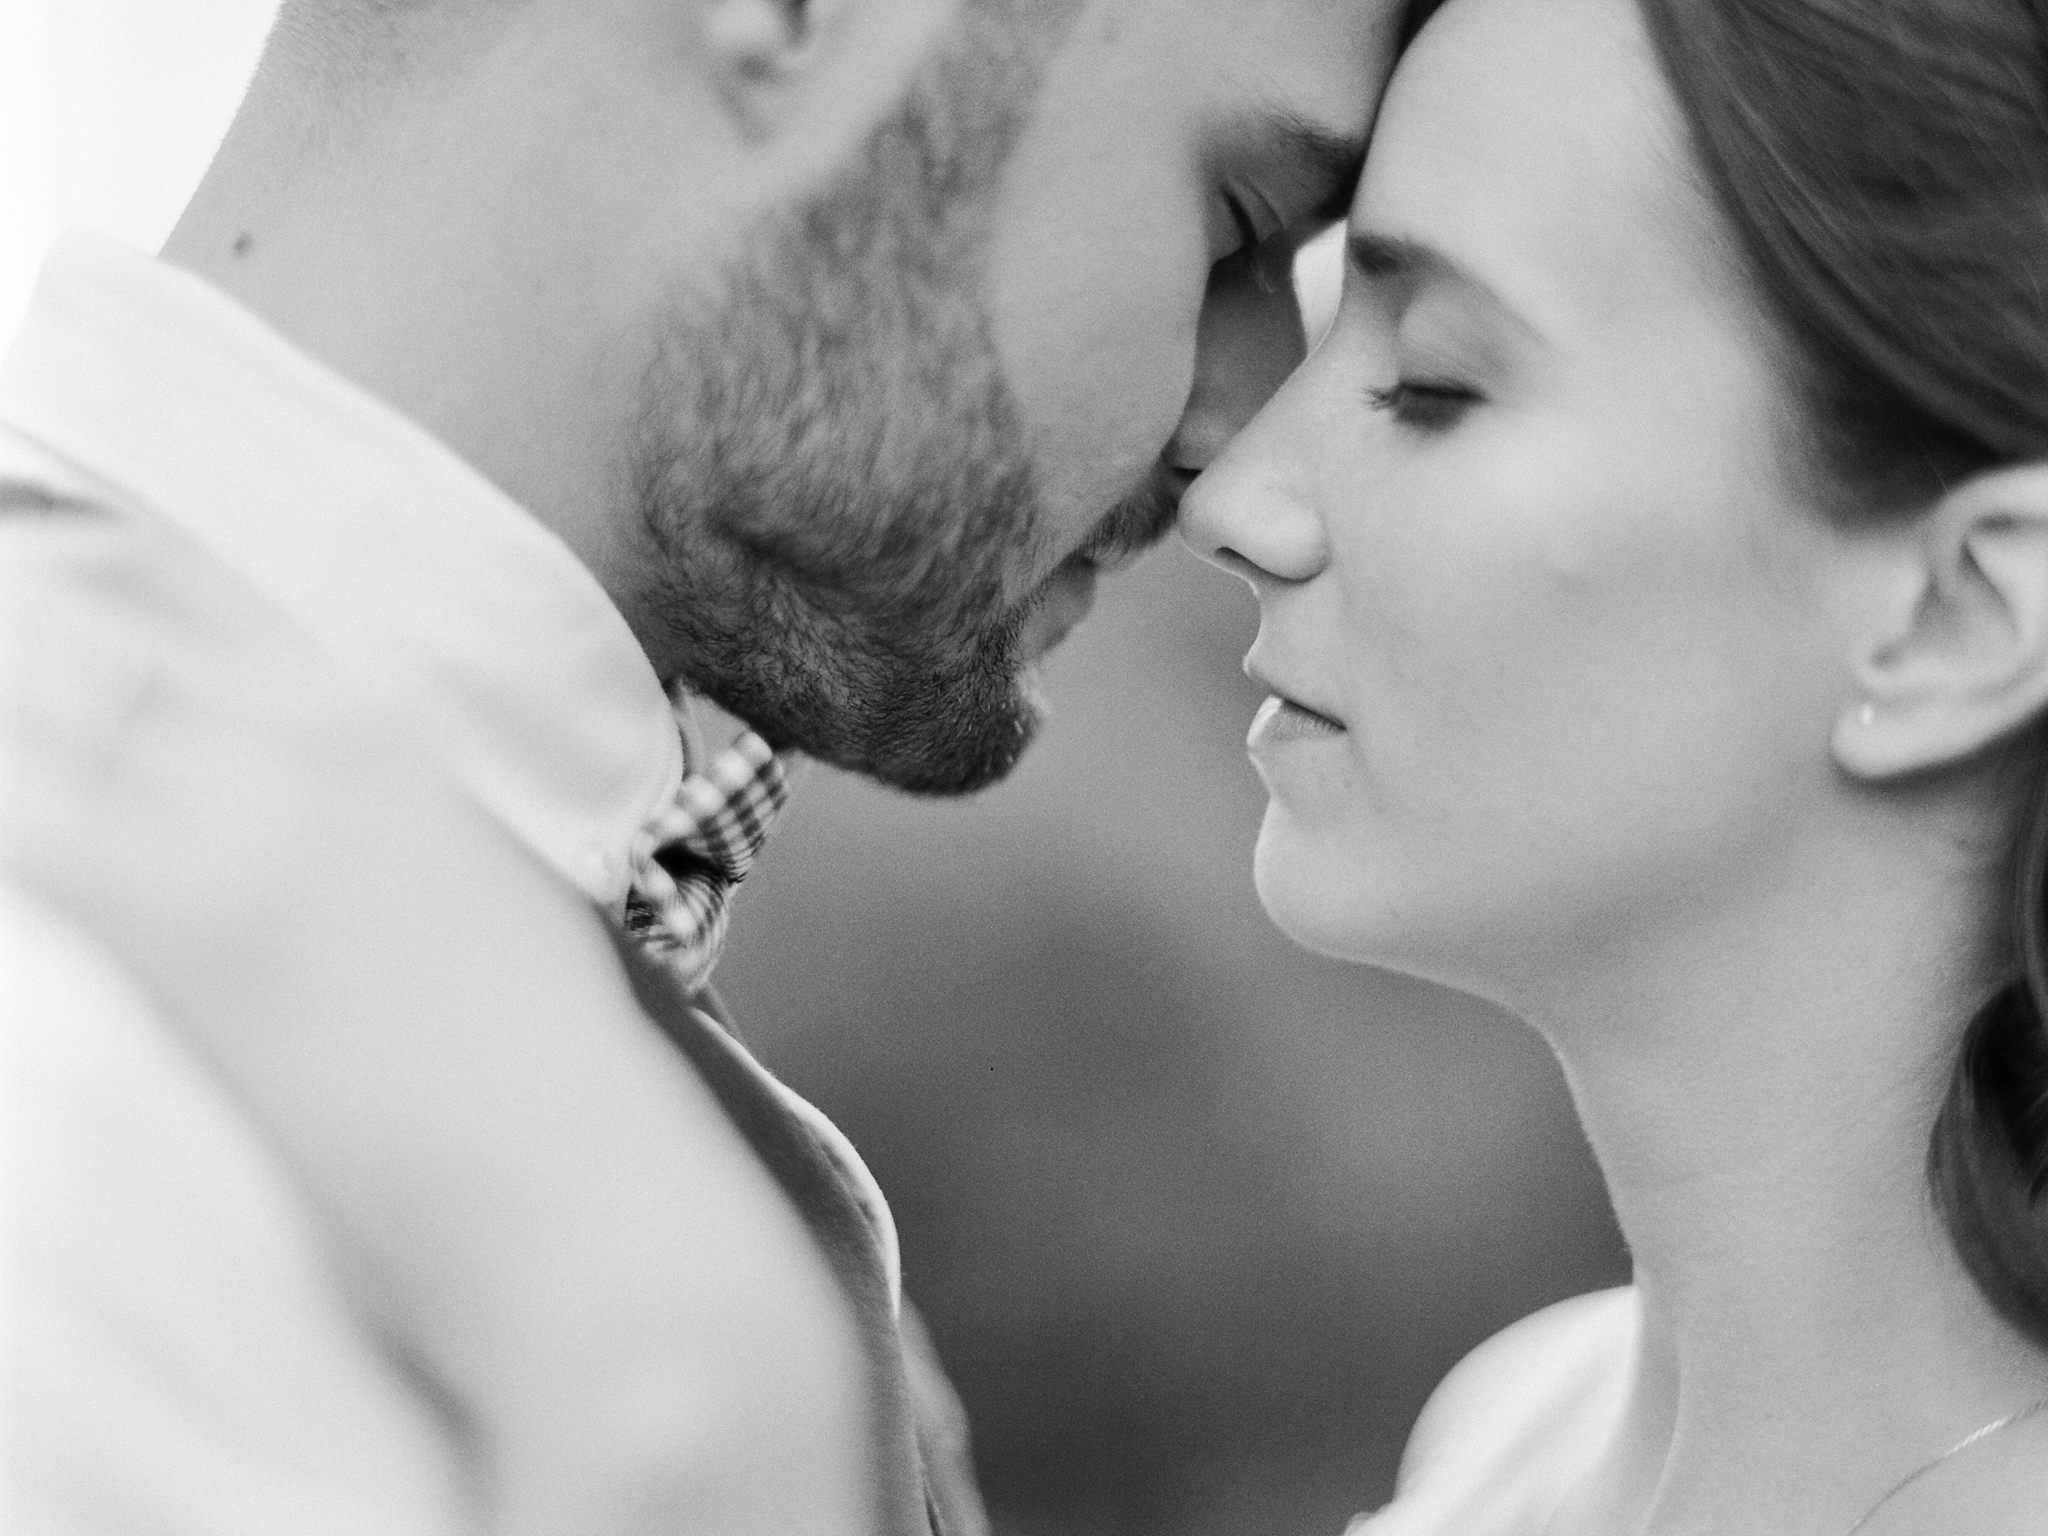 Mariage-a-la-maison-secall-hugo-hennequin-photographe-mariage-perpignan_0126.jpg